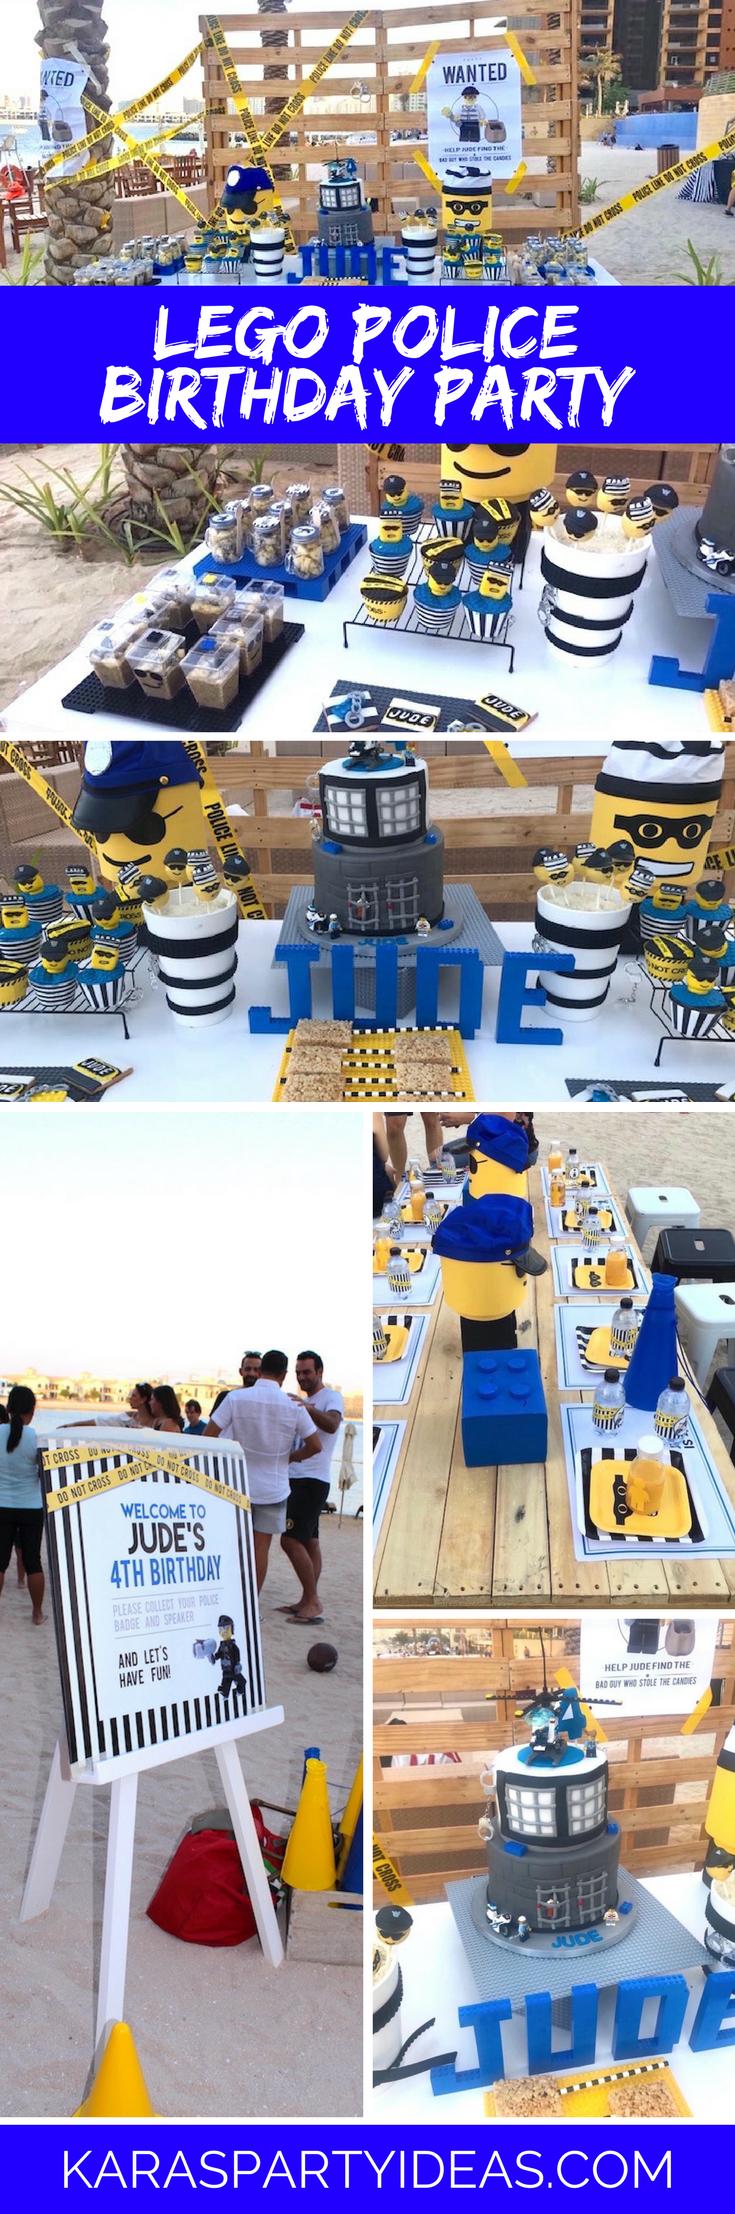 Lego Police Birthday Party via Kara's Party Ideas - KarasPartyIdeas.com